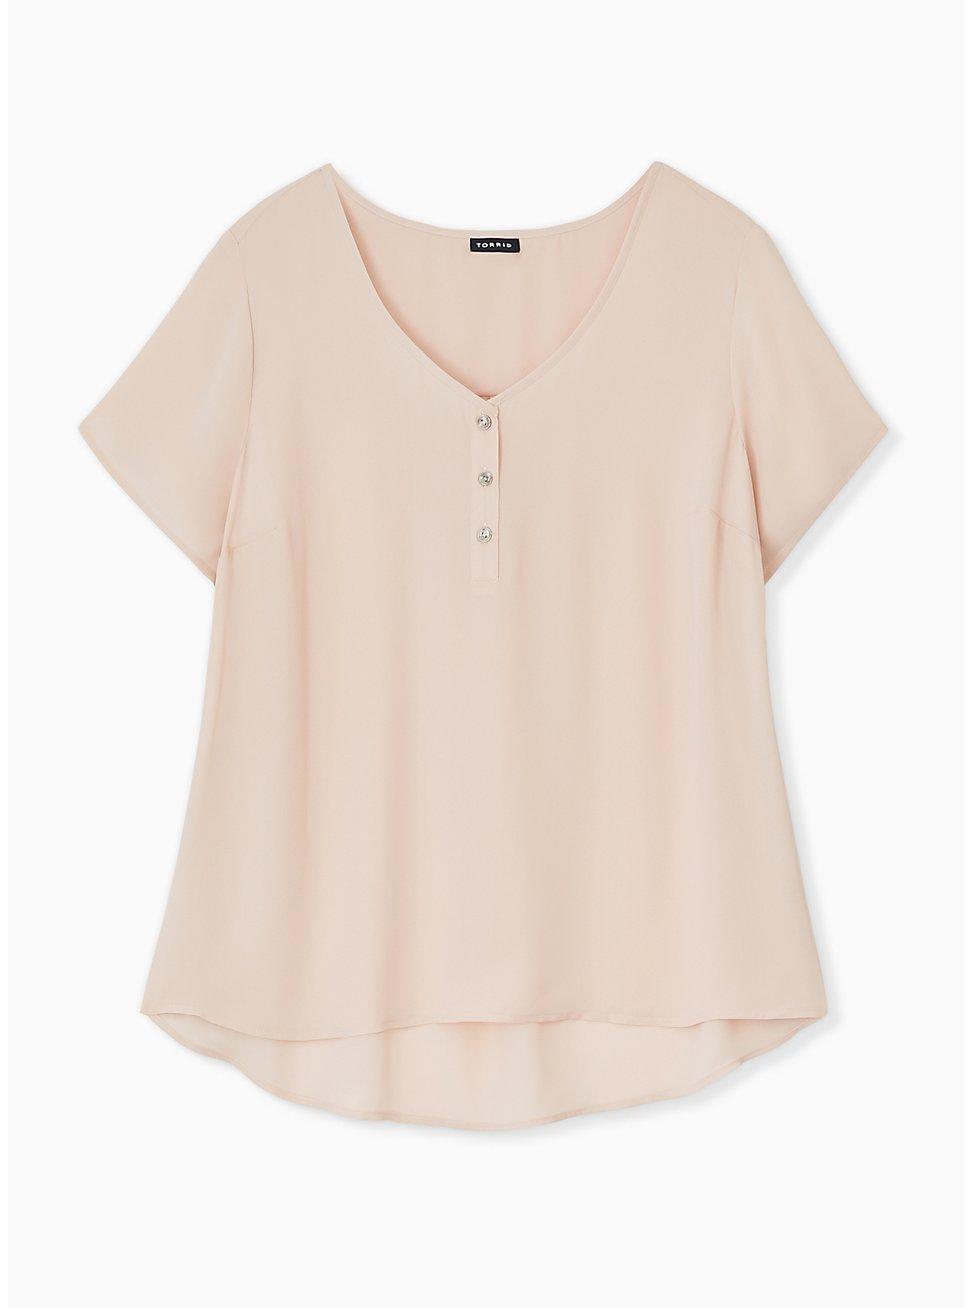 Pale Pink Georgette Button Down Blouse, ROSE DUST, hi-res